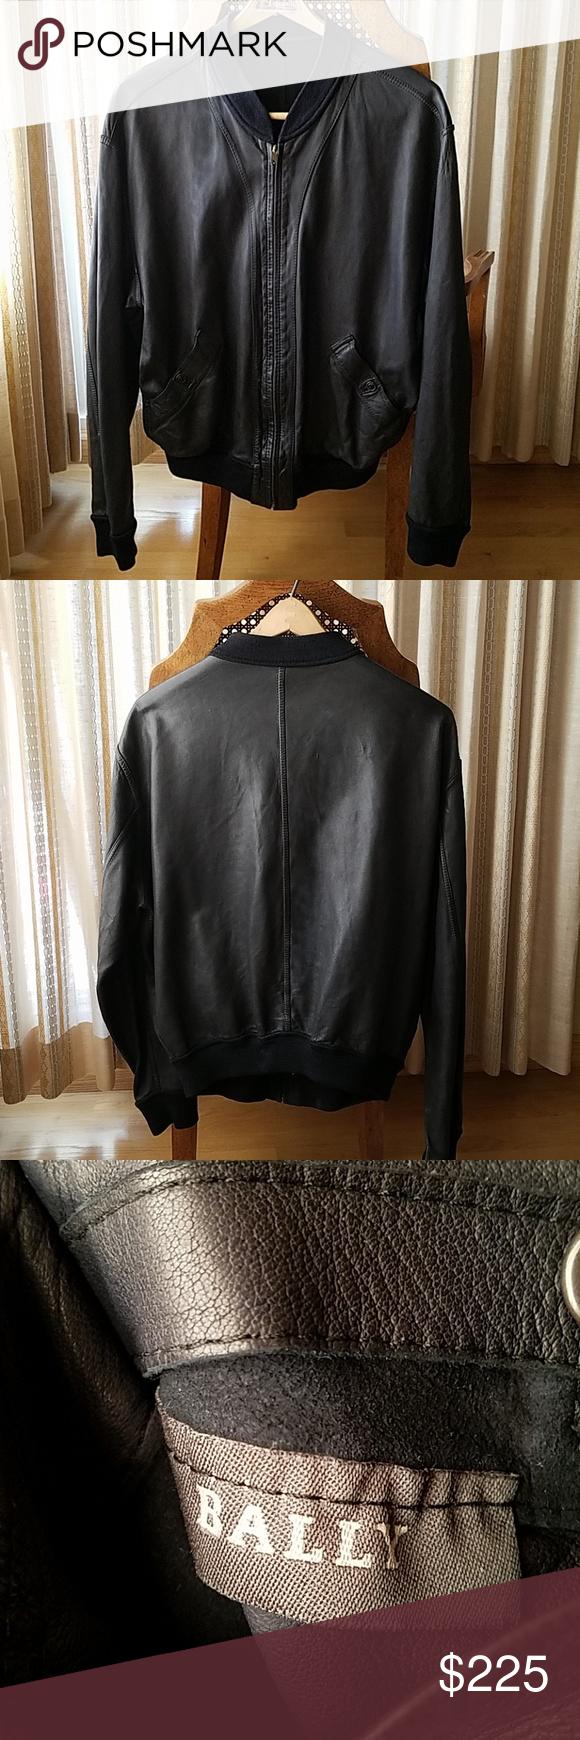 Reversible Bally Leather Bomber Jacket Leather Bomber Jacket Leather Bomber Clothes Design [ 1740 x 580 Pixel ]